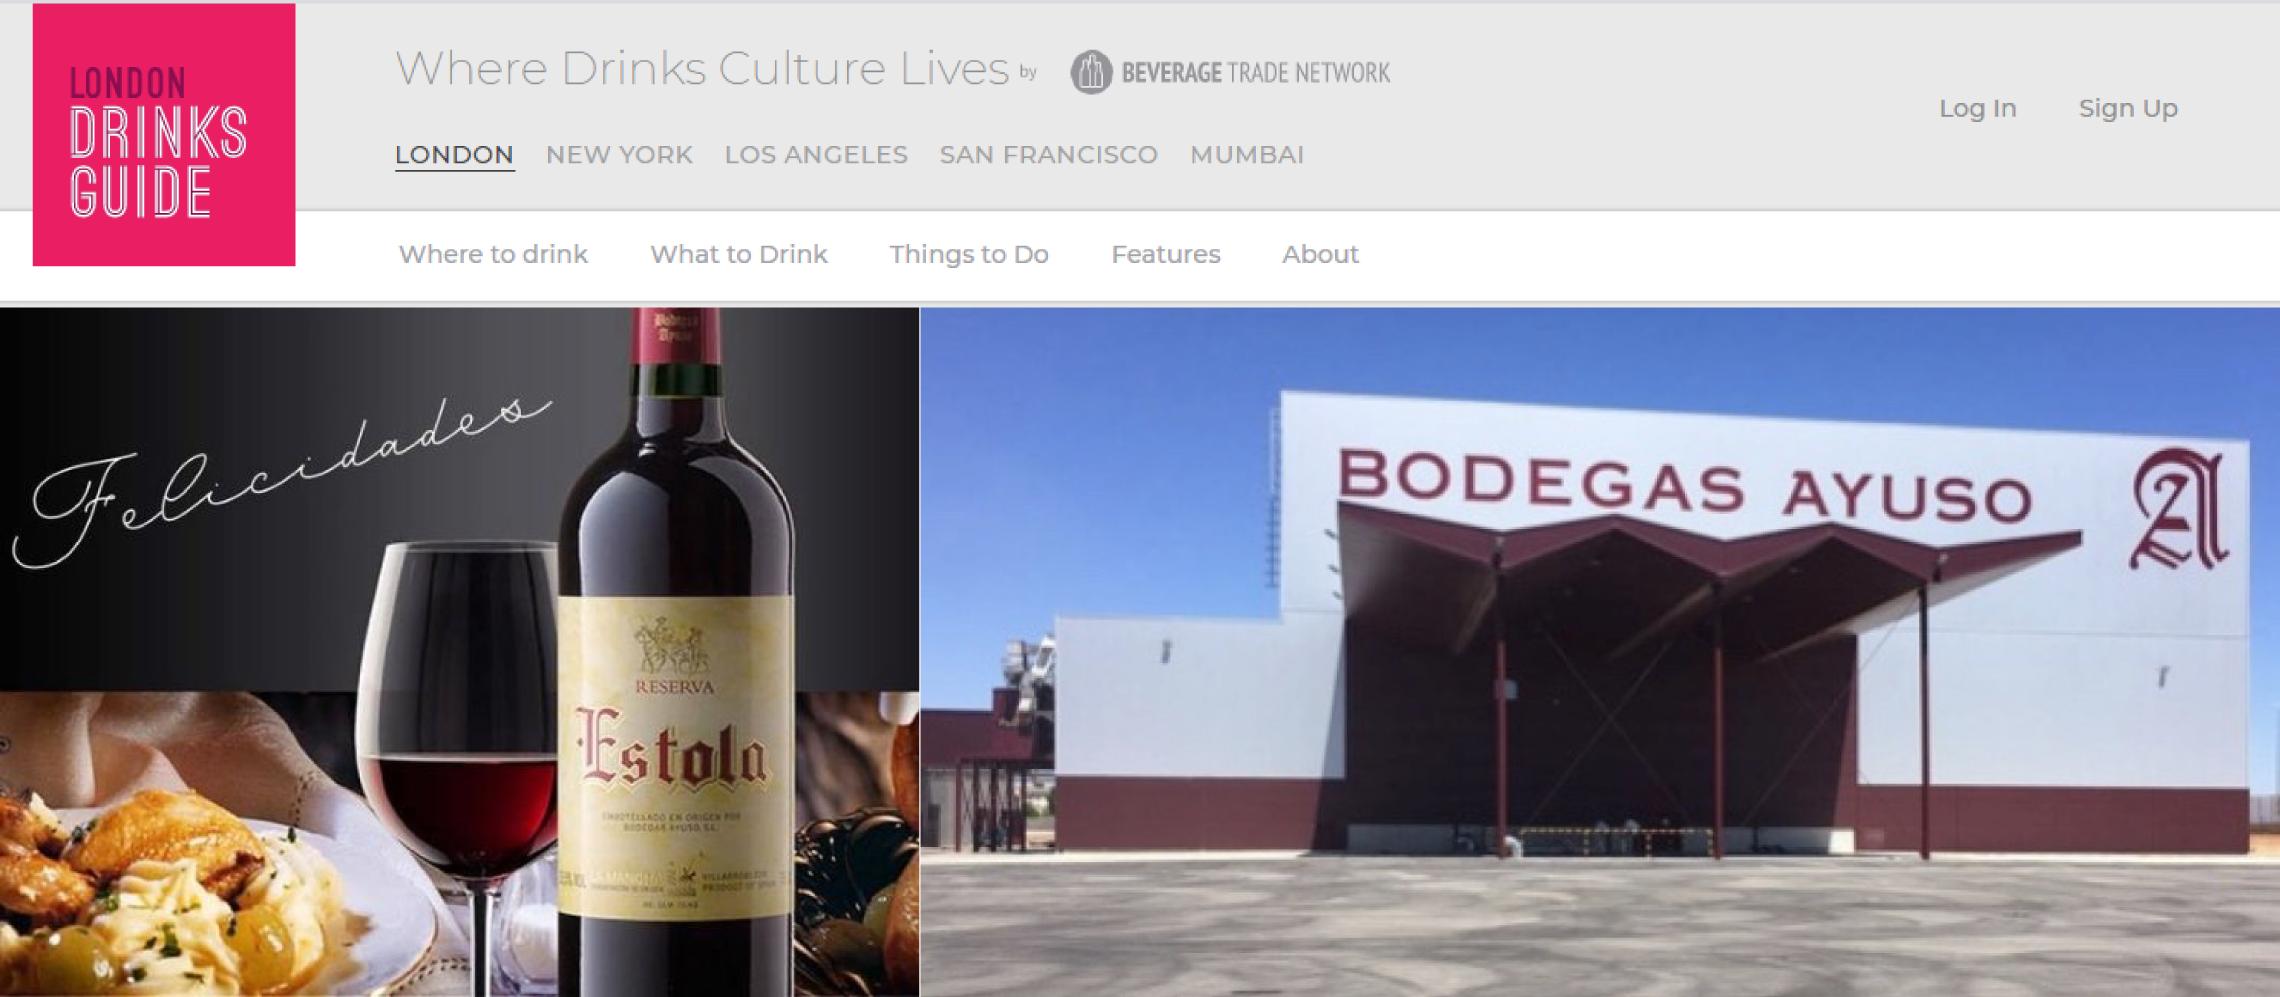 Photo for: BODEGAS AYUSO - La Mancha Winery